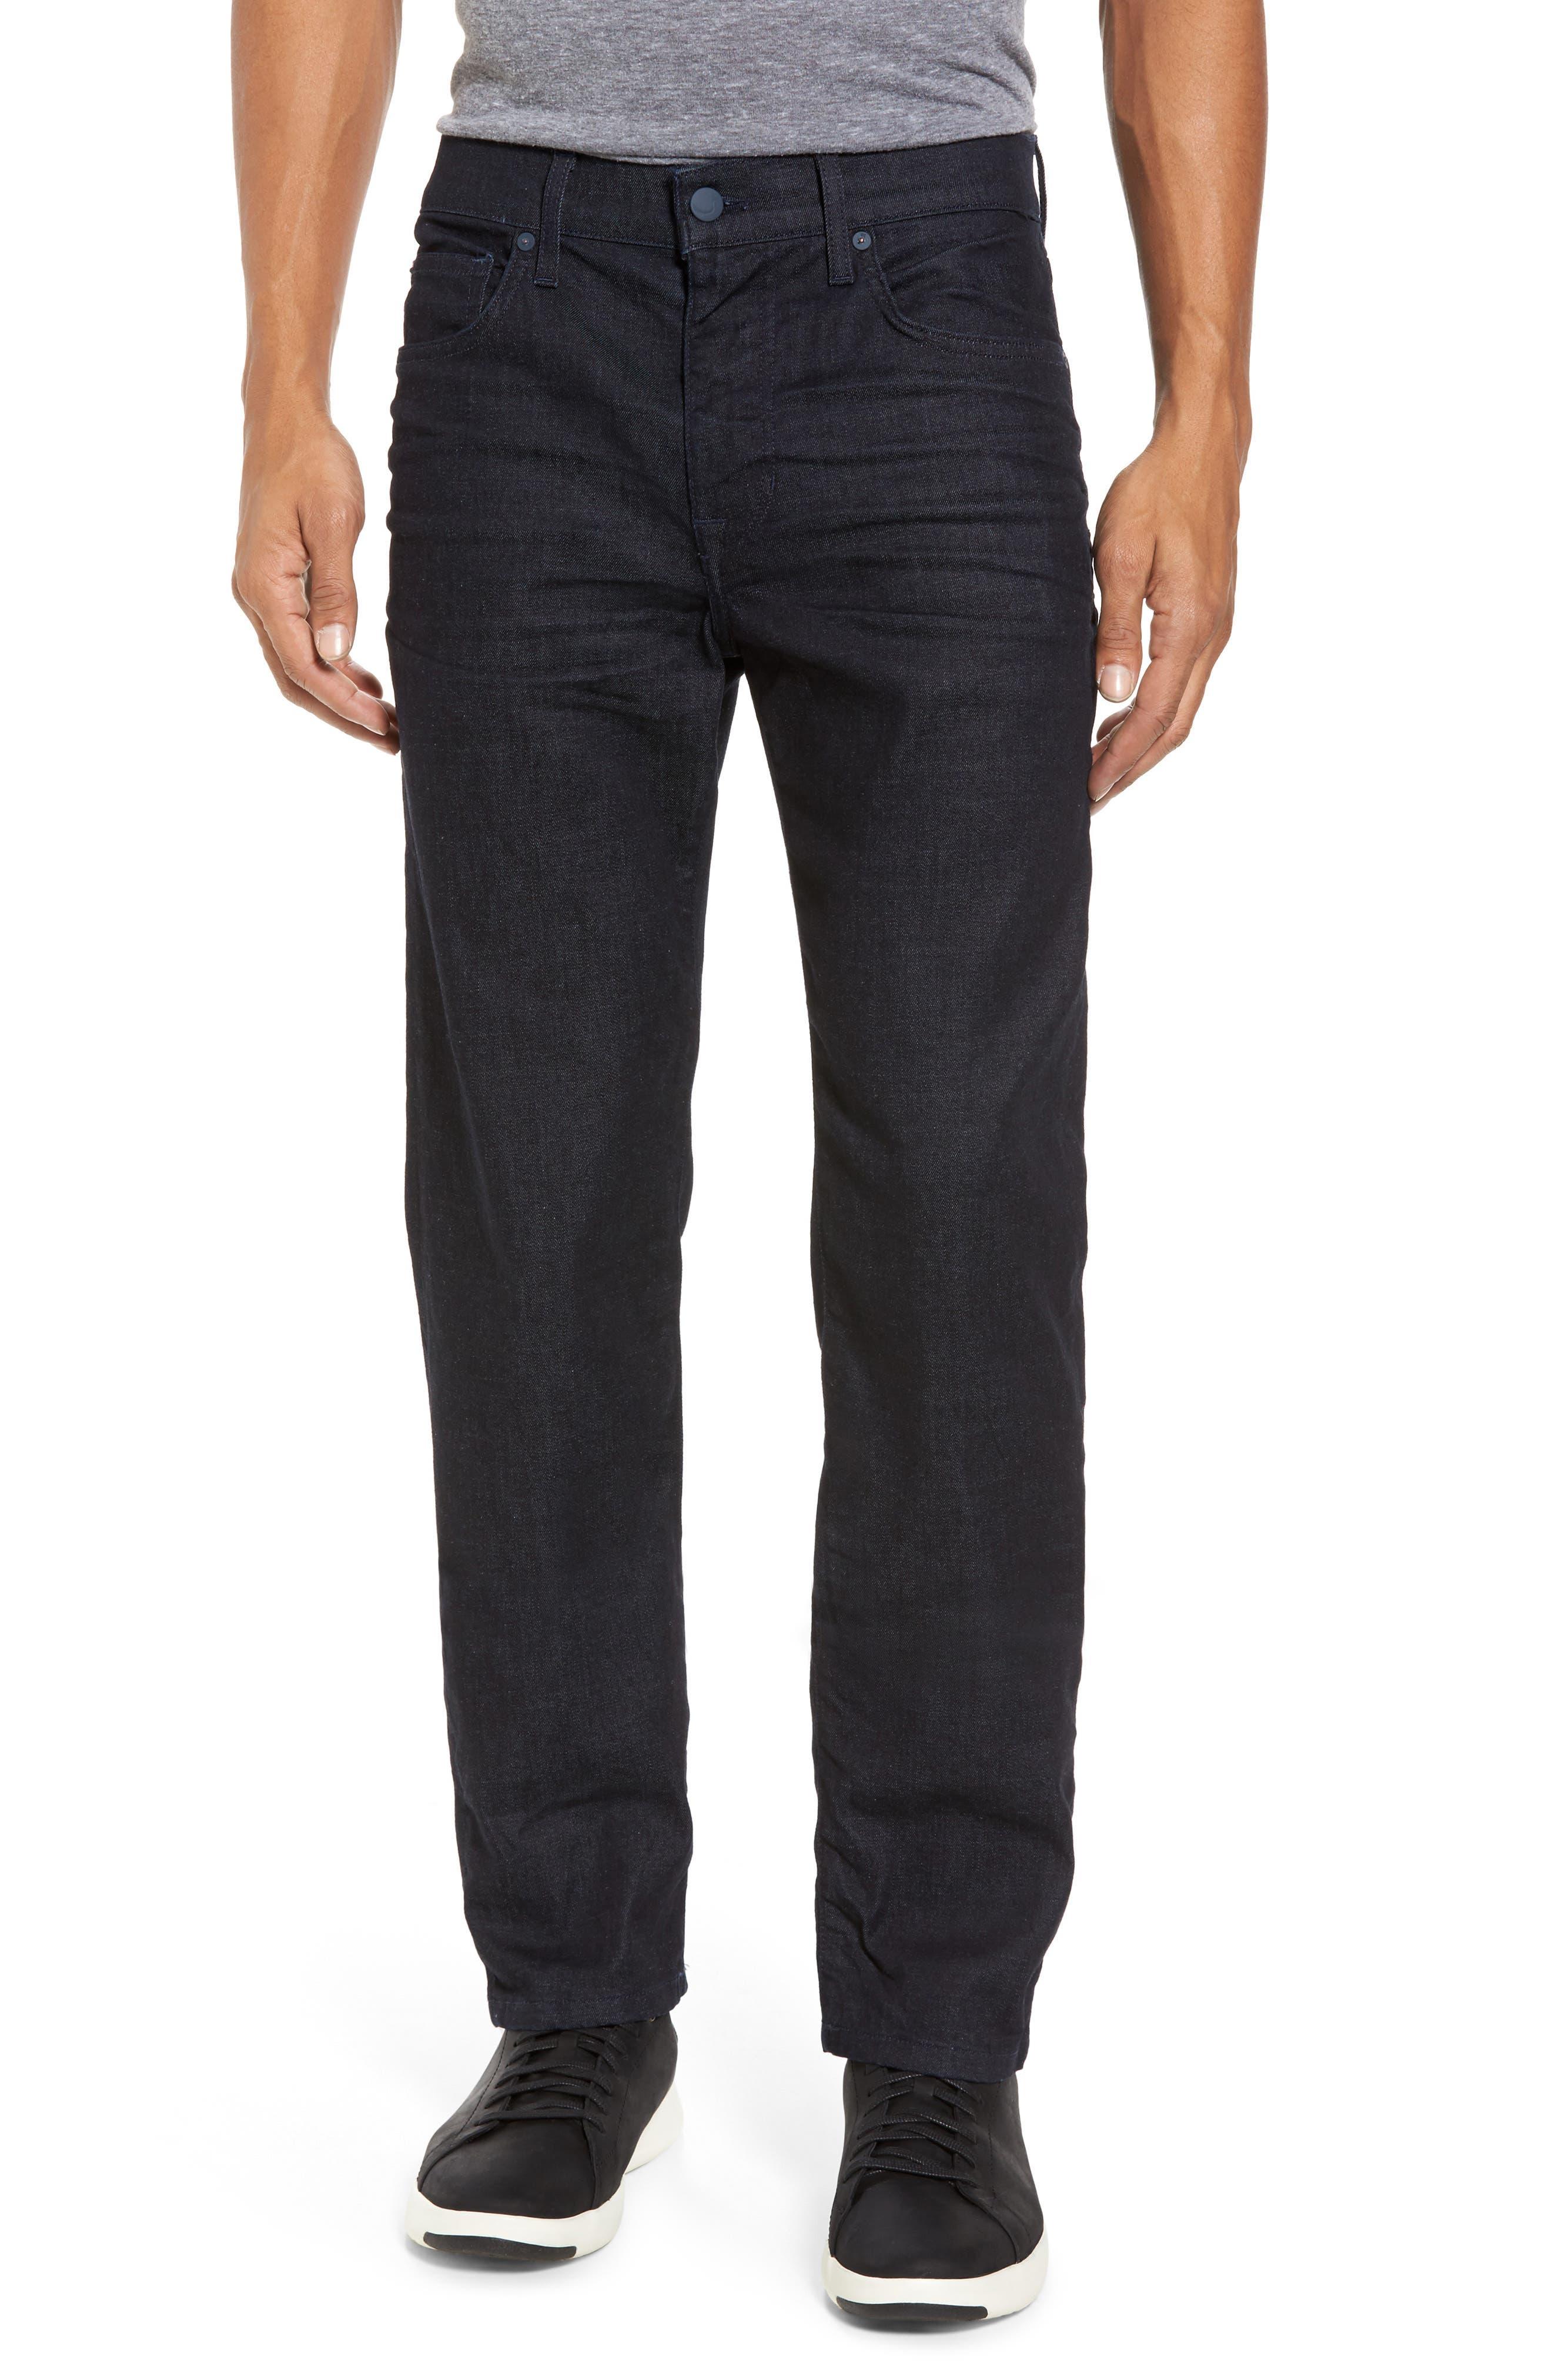 Main Image - Joe's Brixton Slim Straight Fit Jeans (Foster)